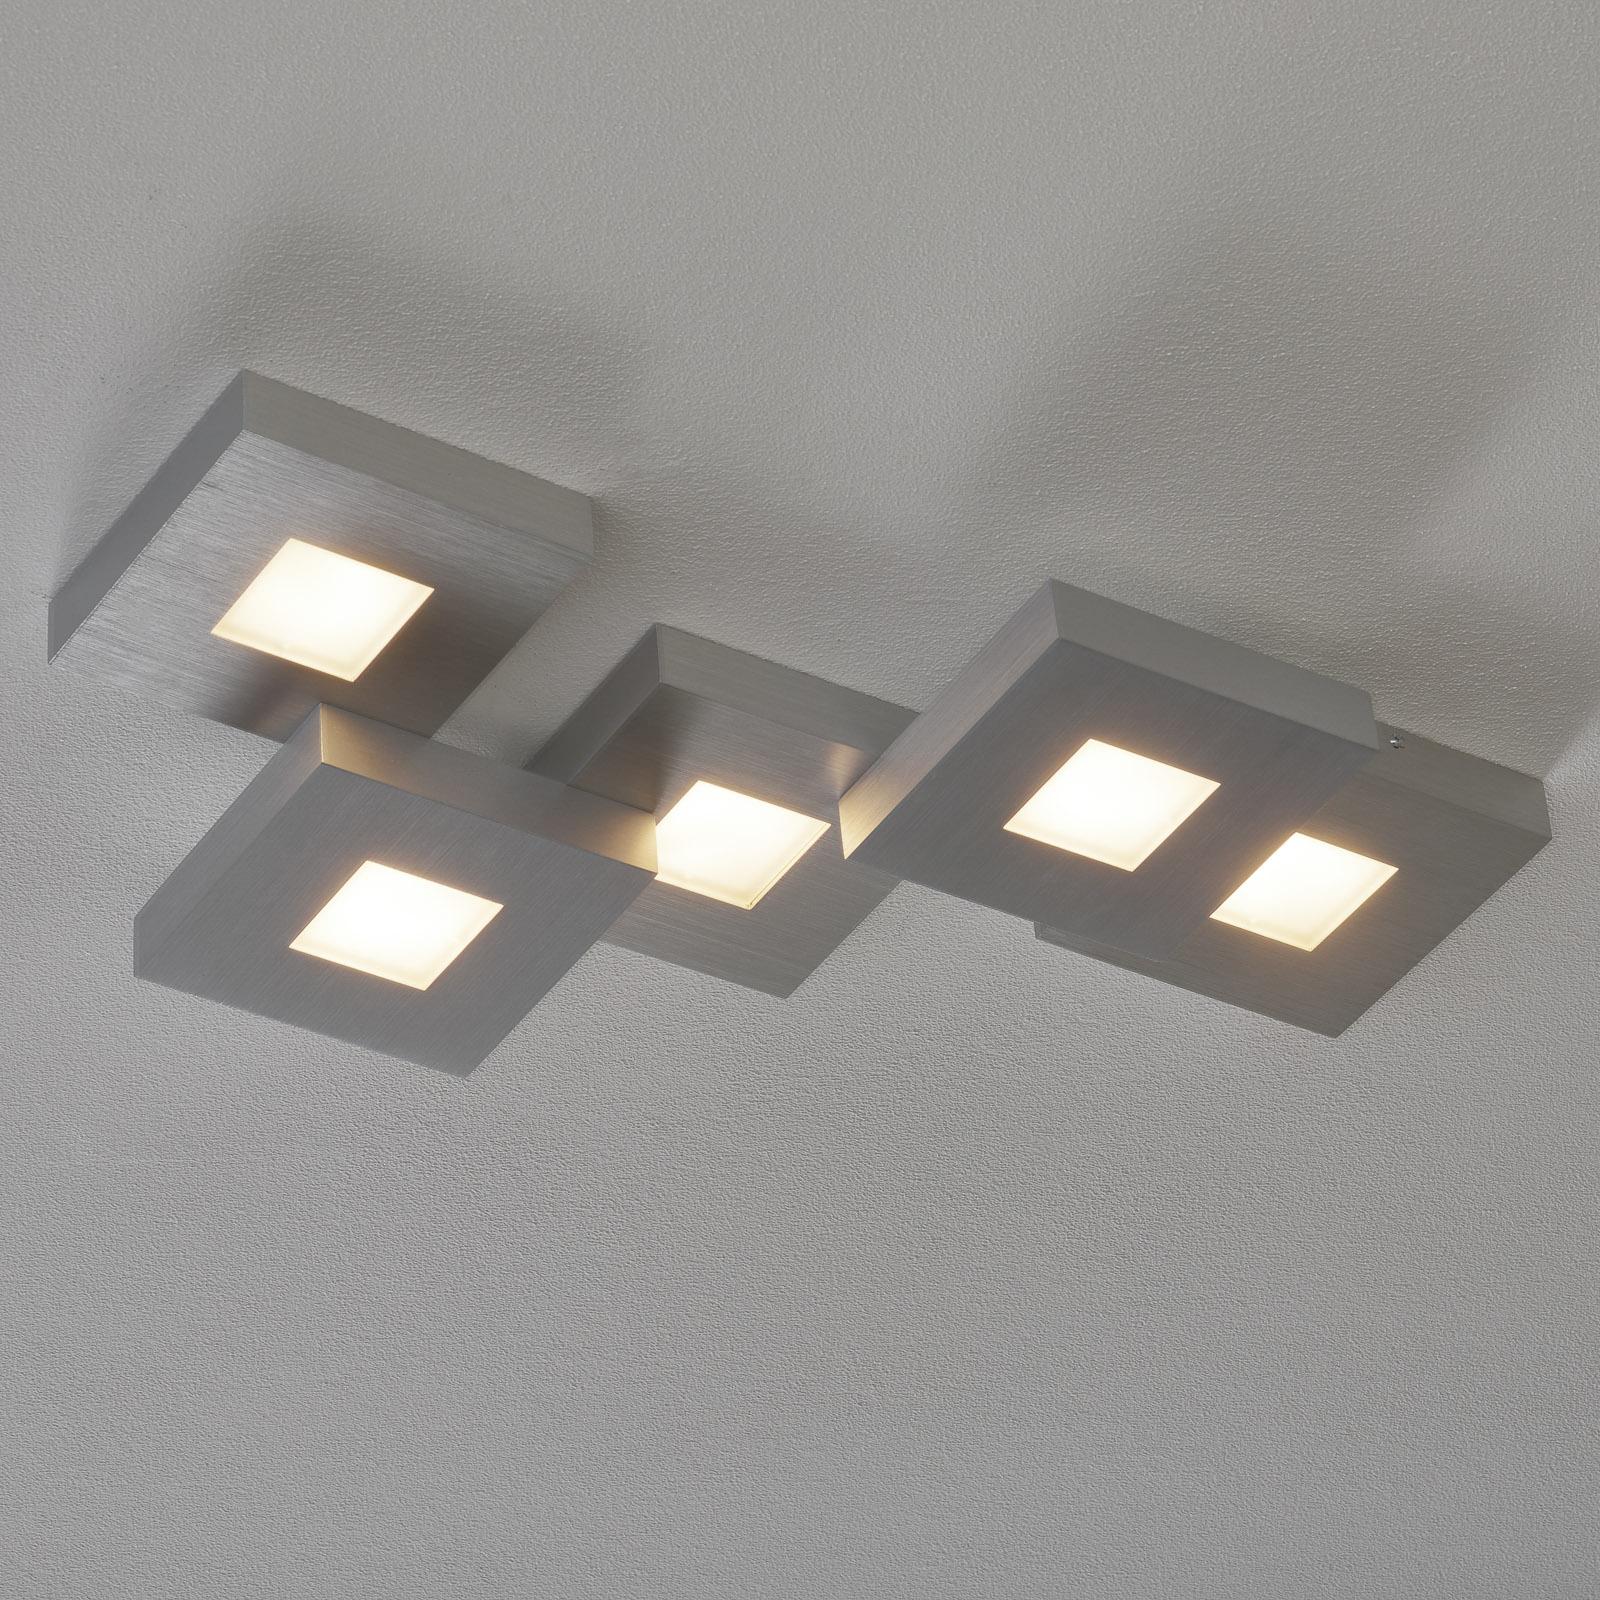 Ekstrawagancka lampa sufitowa LED Cubus